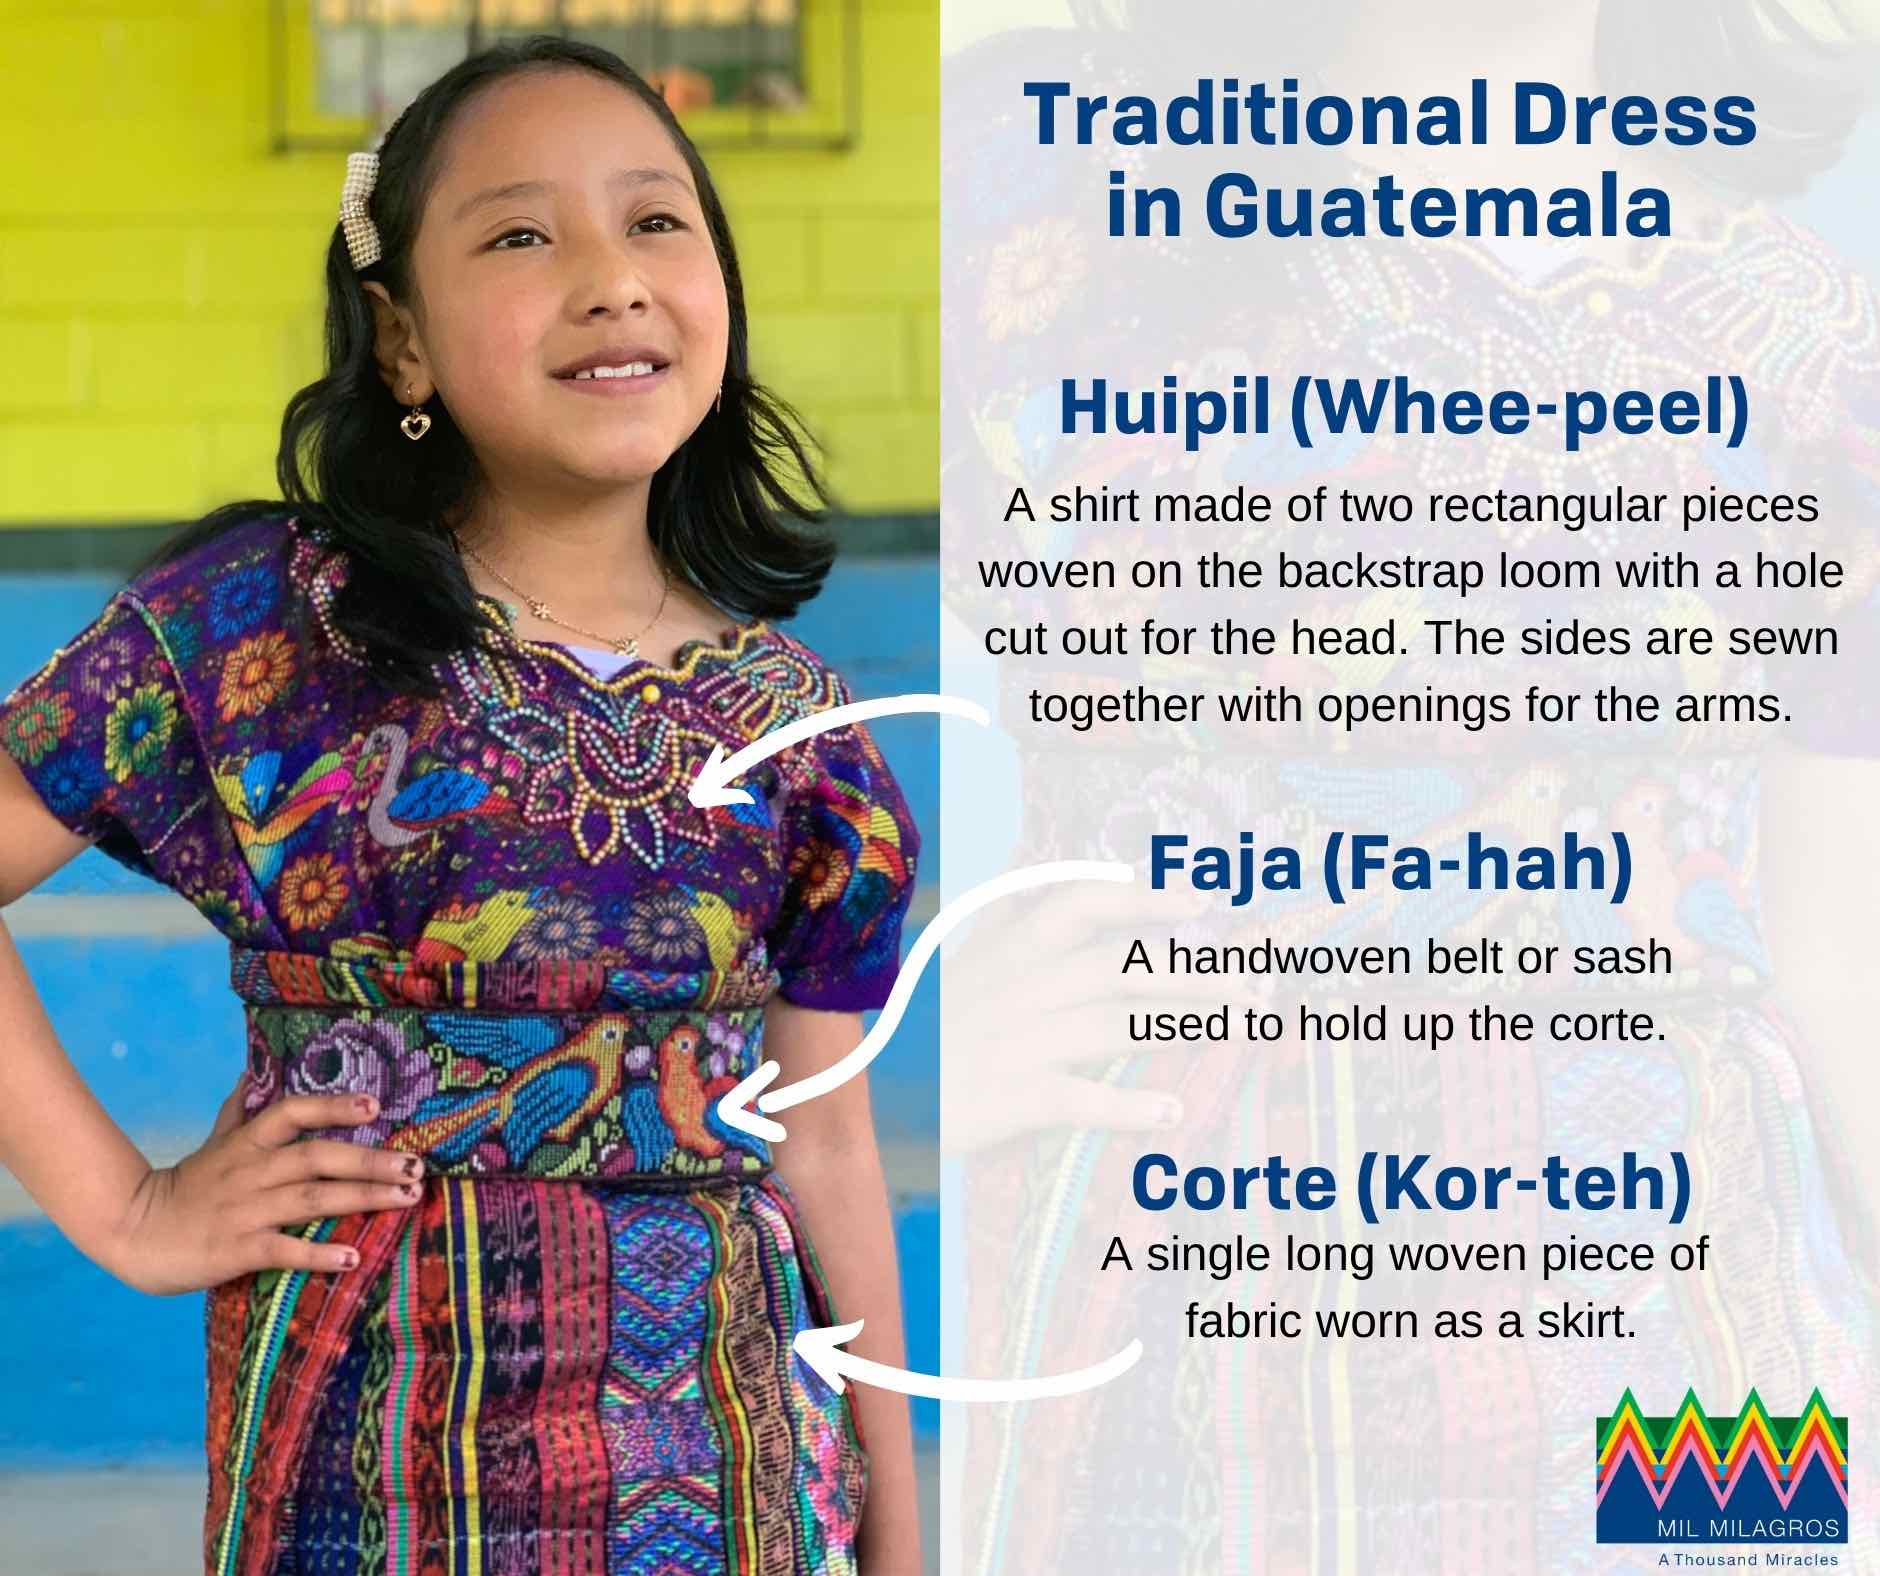 Traditional dress in Guatemala